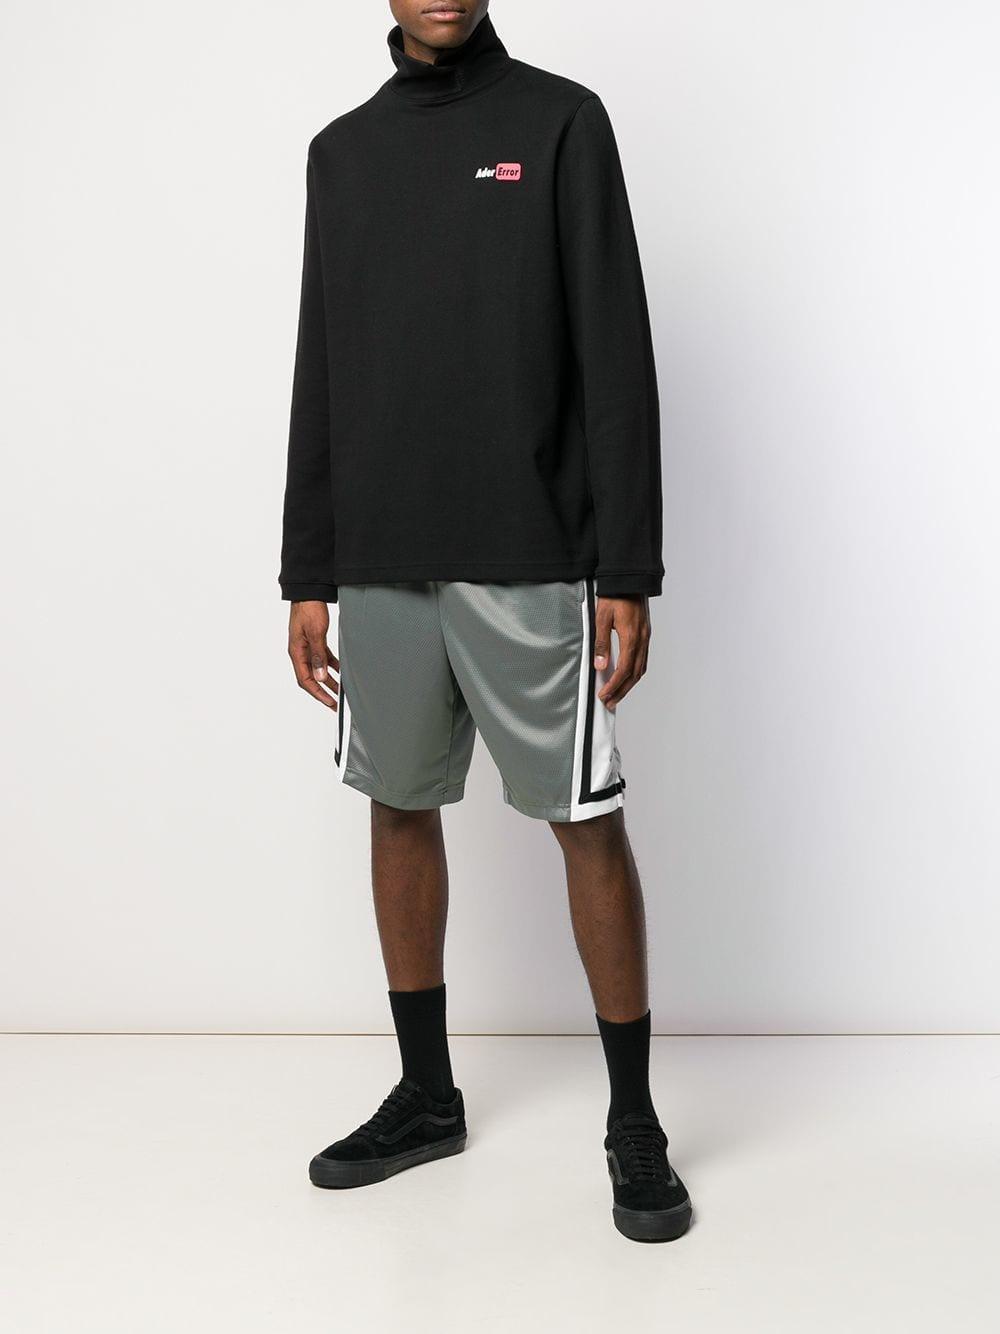 8e09ee0ddcc4 Nike Jordan Dri-fit Shorts in Green for Men - Lyst